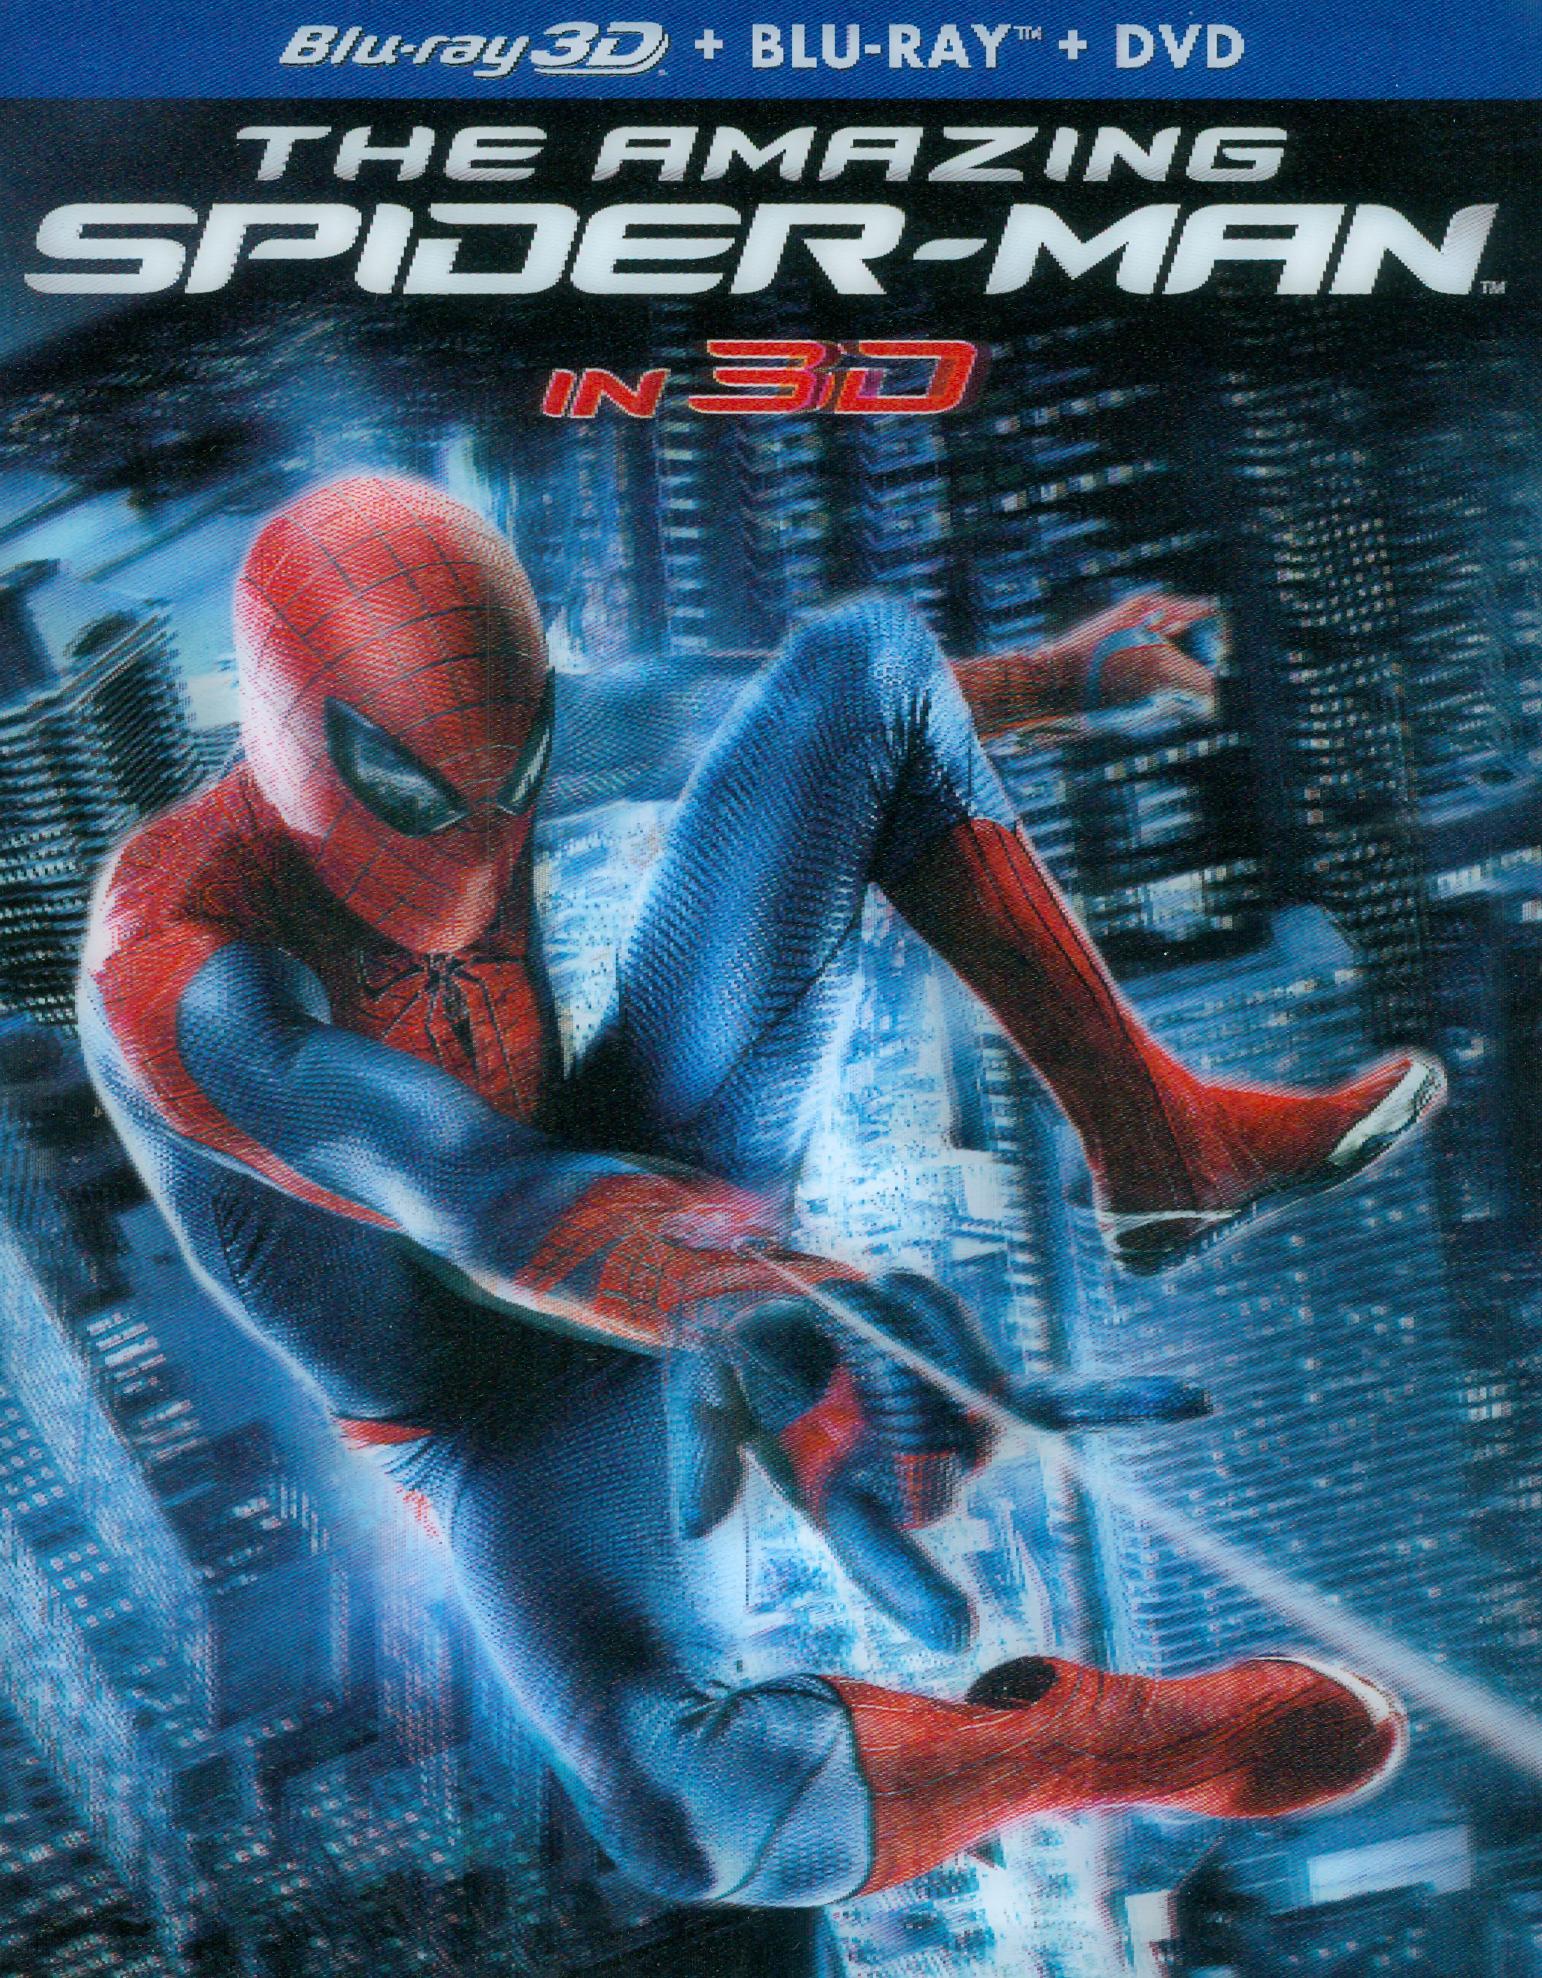 Spider-Man in film - Wikipedia